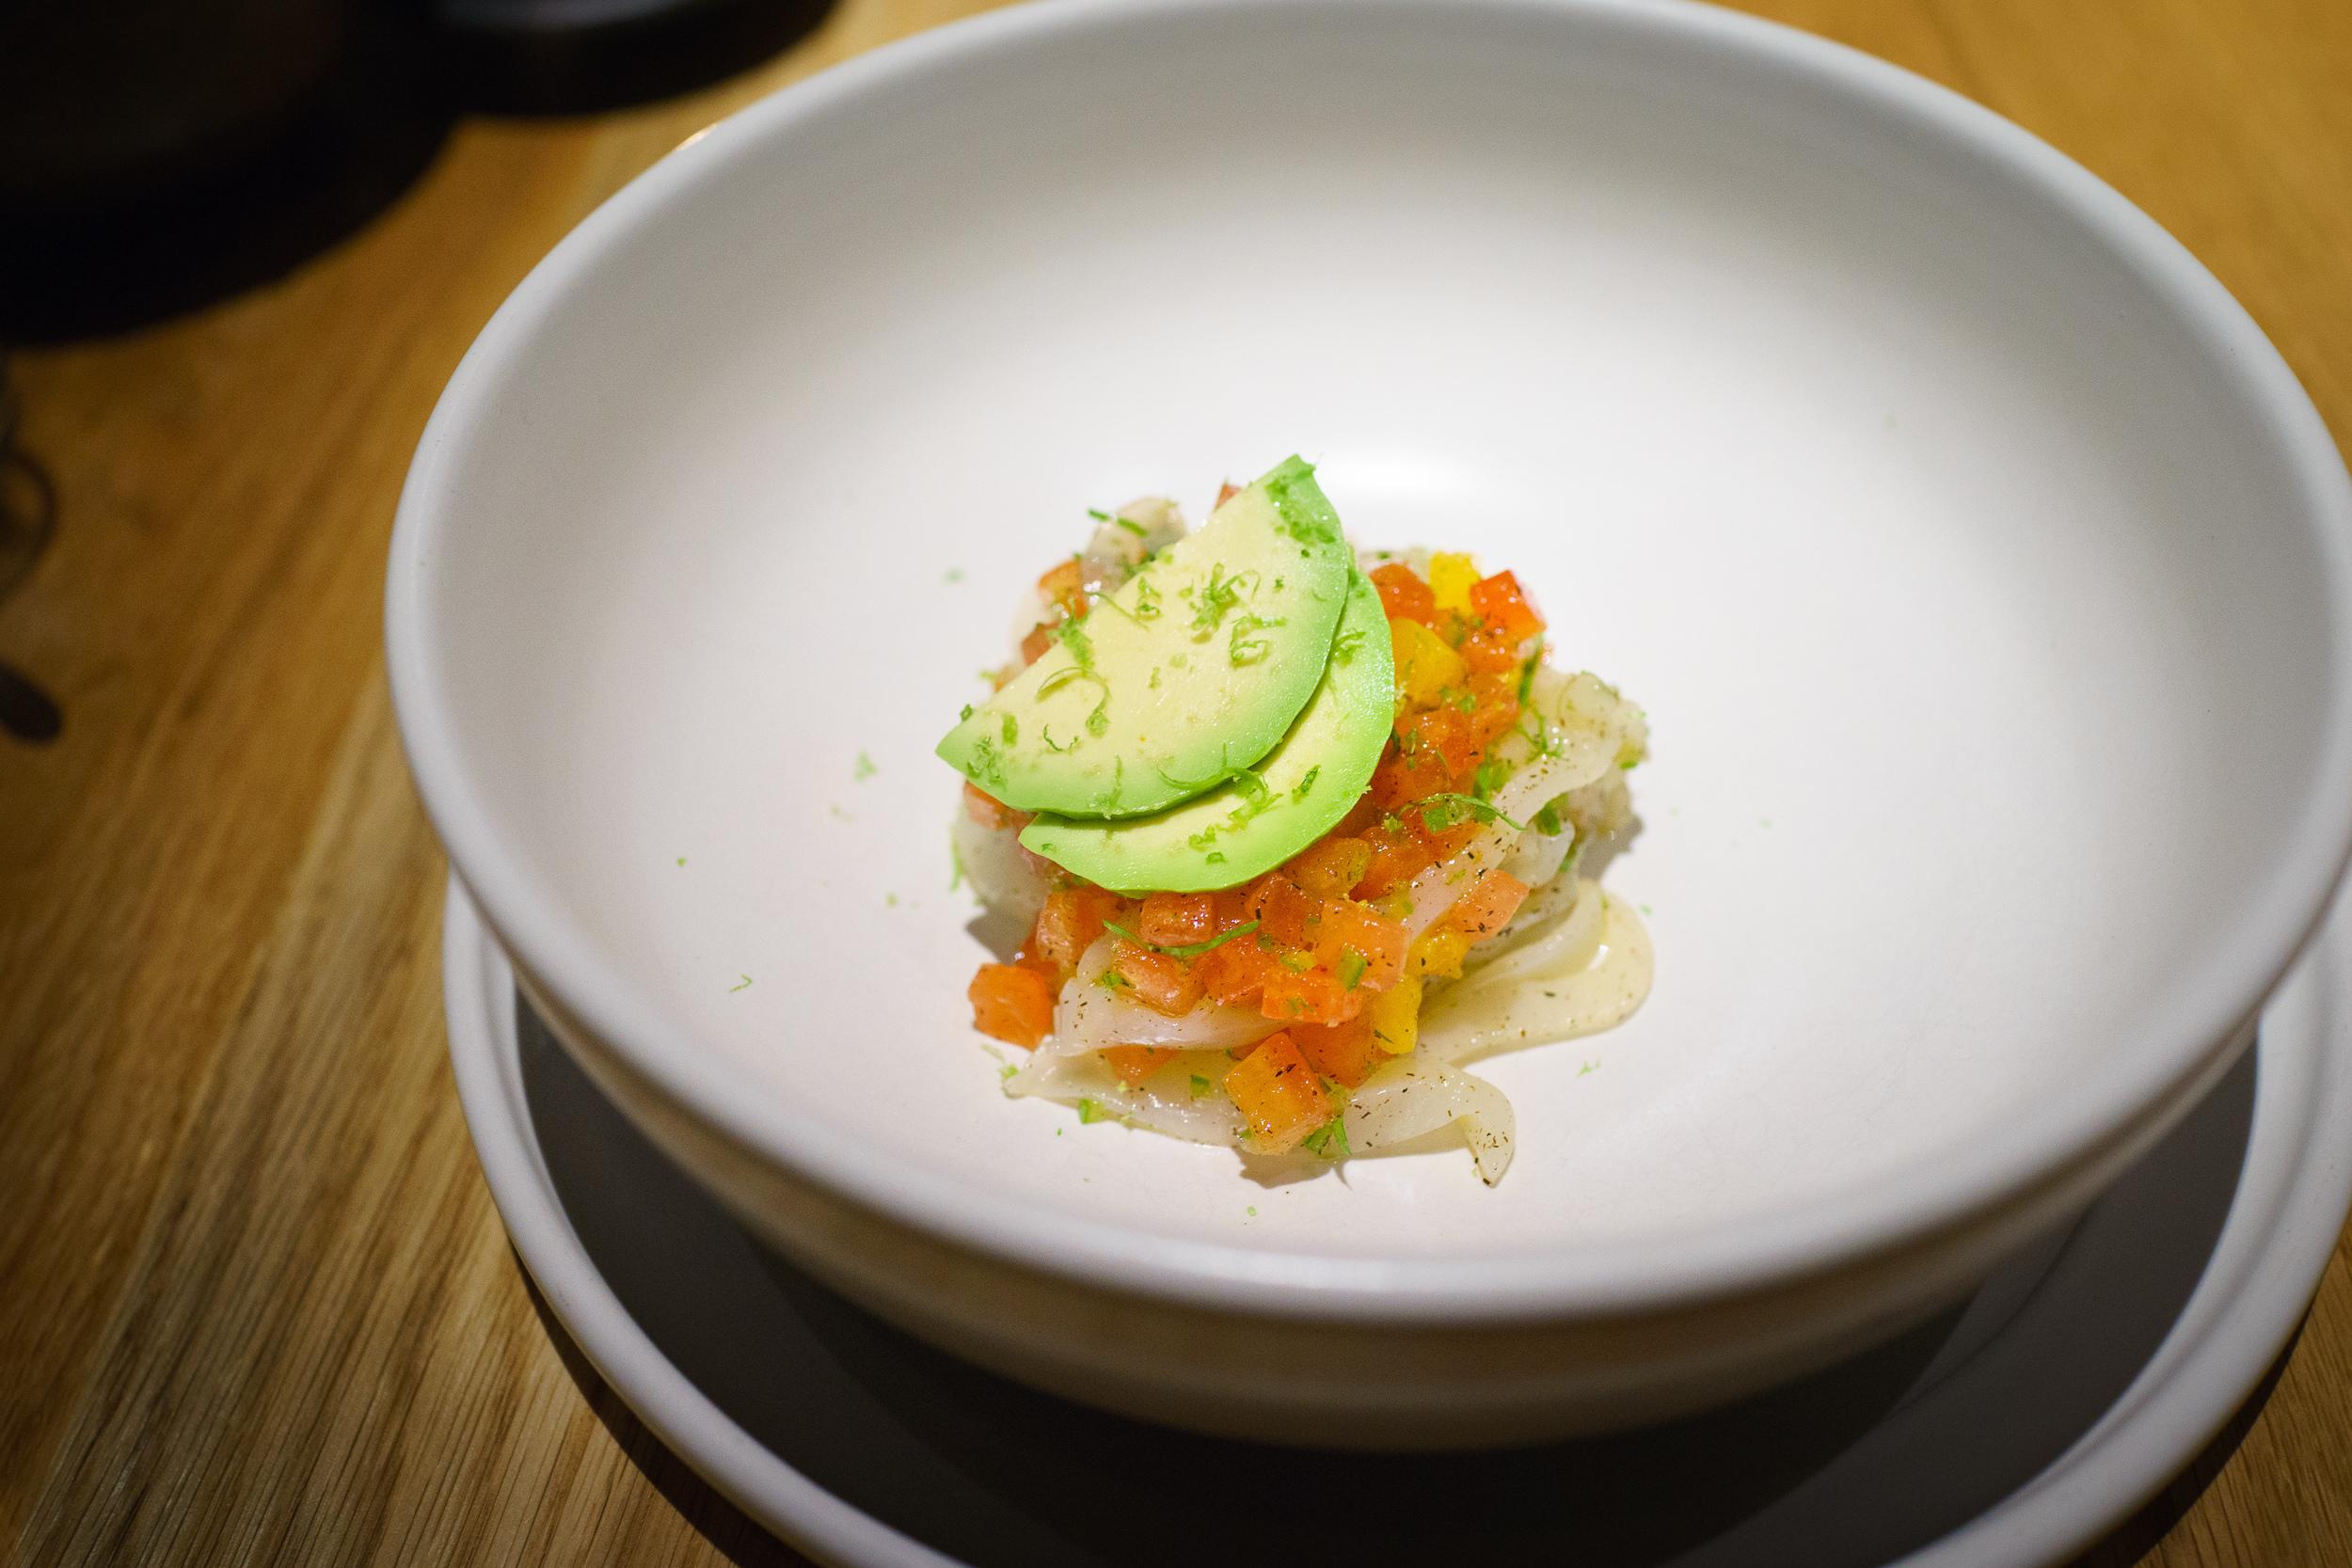 Smoked raw sepia, salsa mexicana, avocado